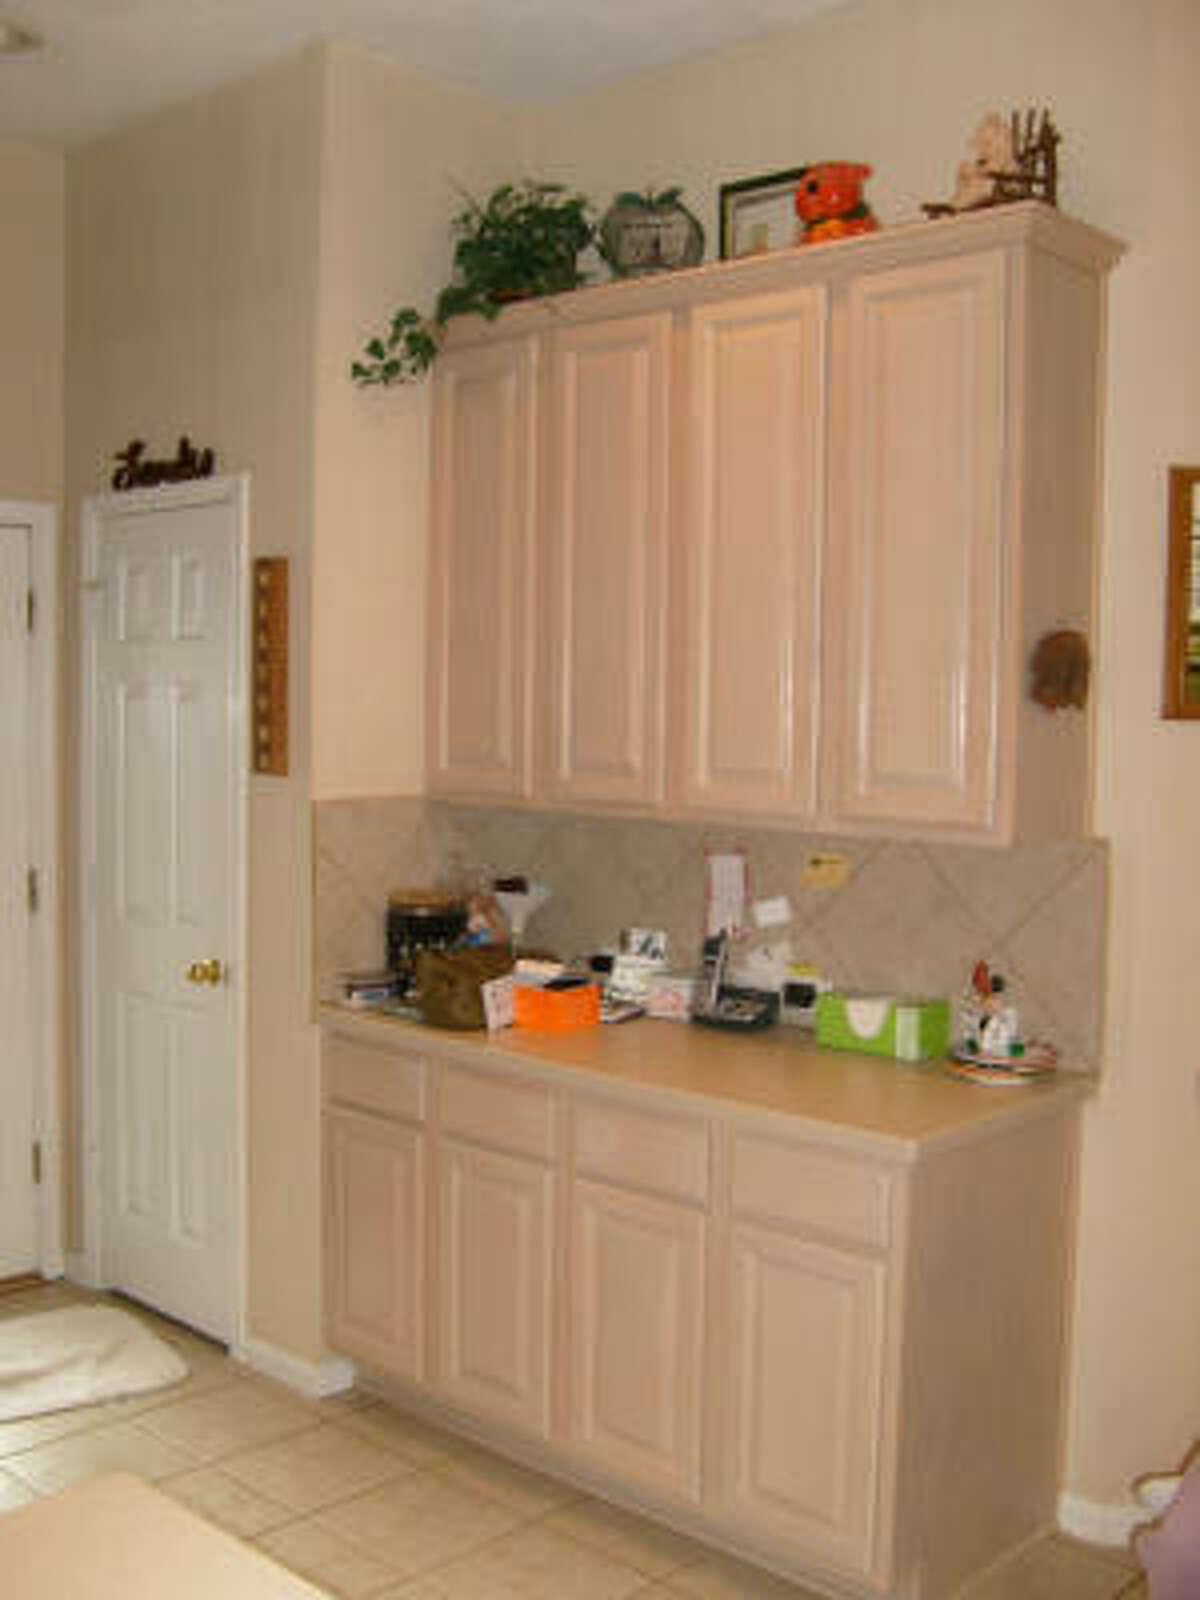 Hutch in a before kitchen that interior designer Carla Aston worked on.